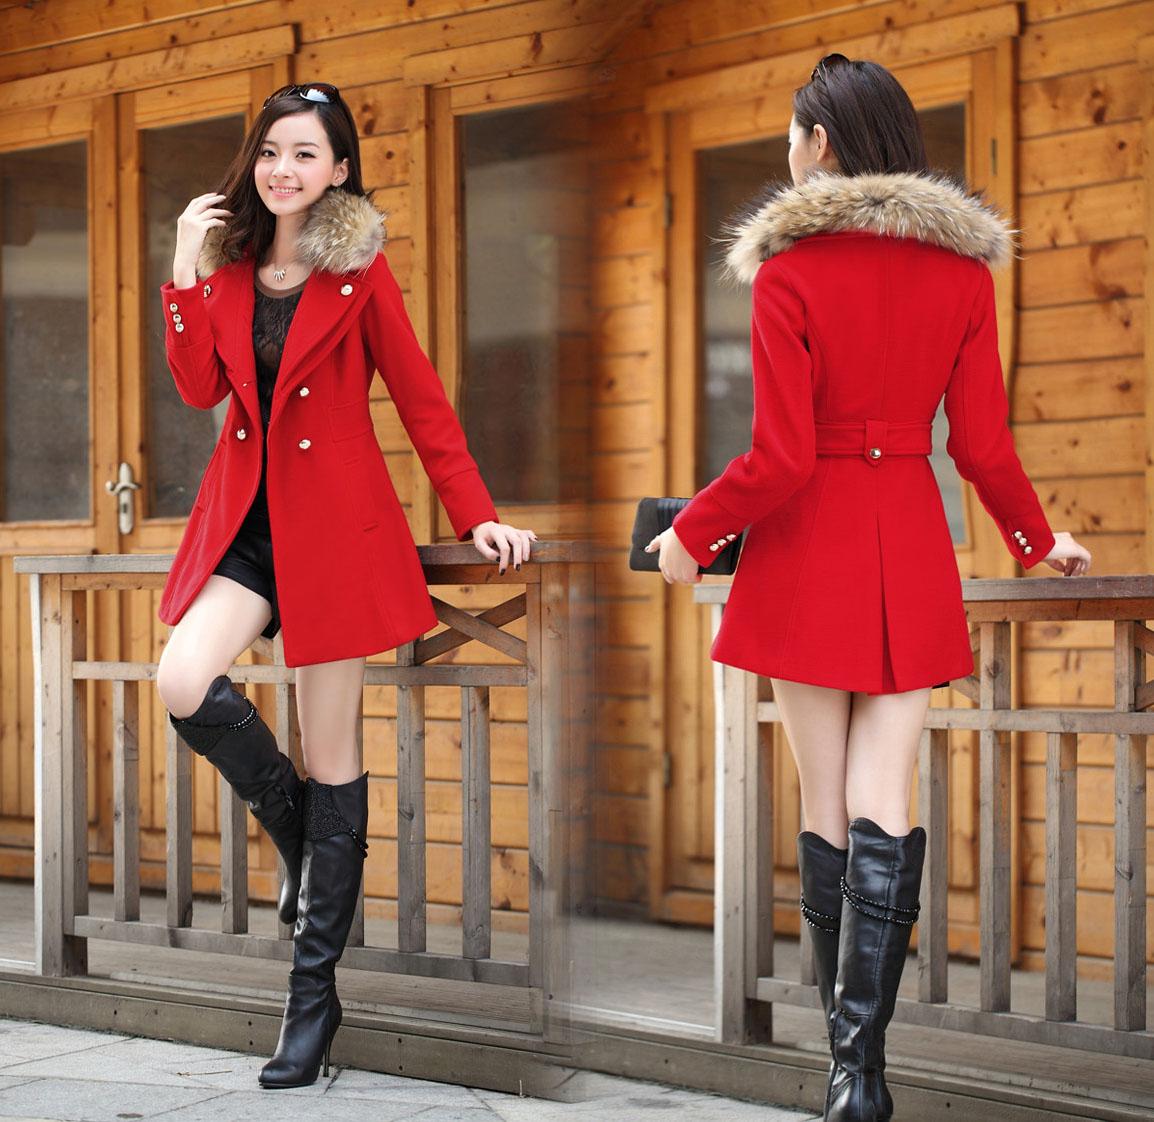 женское пальто 秋冬装结婚礼服红色新娘服装敬酒回门衣服订婚宴会大衣毛呢外套